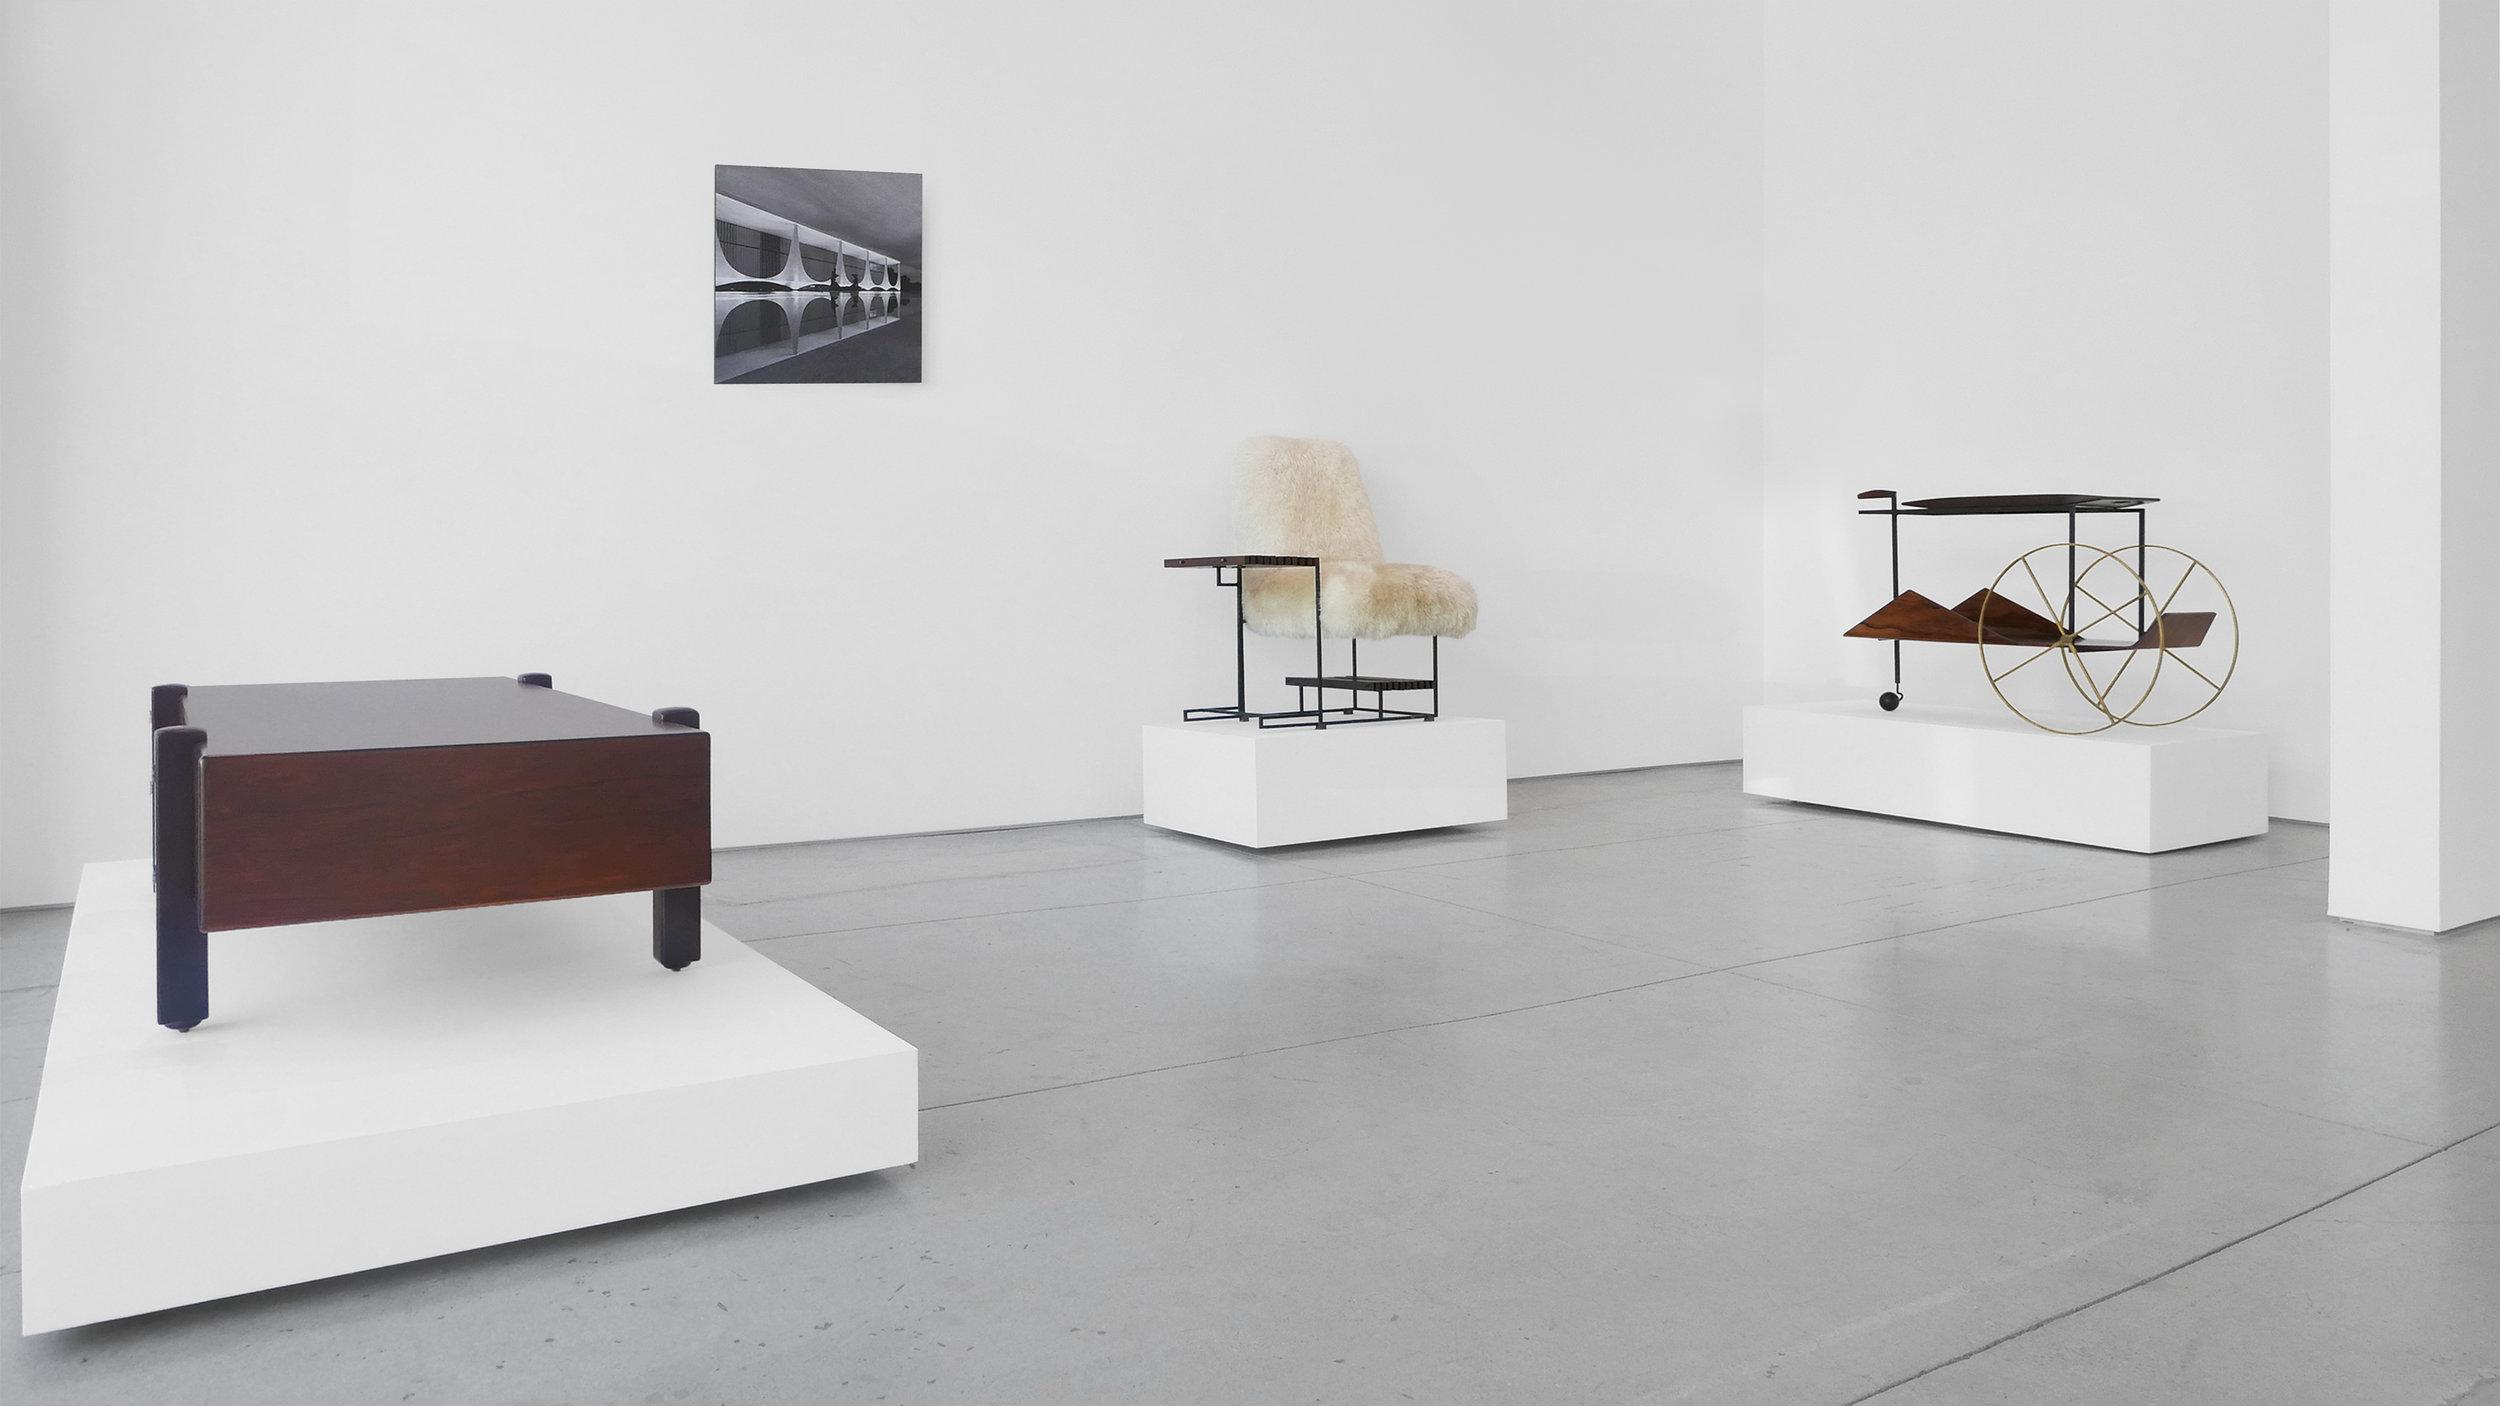 Design Brasileiro, Curated by Ulysses de Santi, Peter Blake Gallery, 2018, Installation View_3.jpg